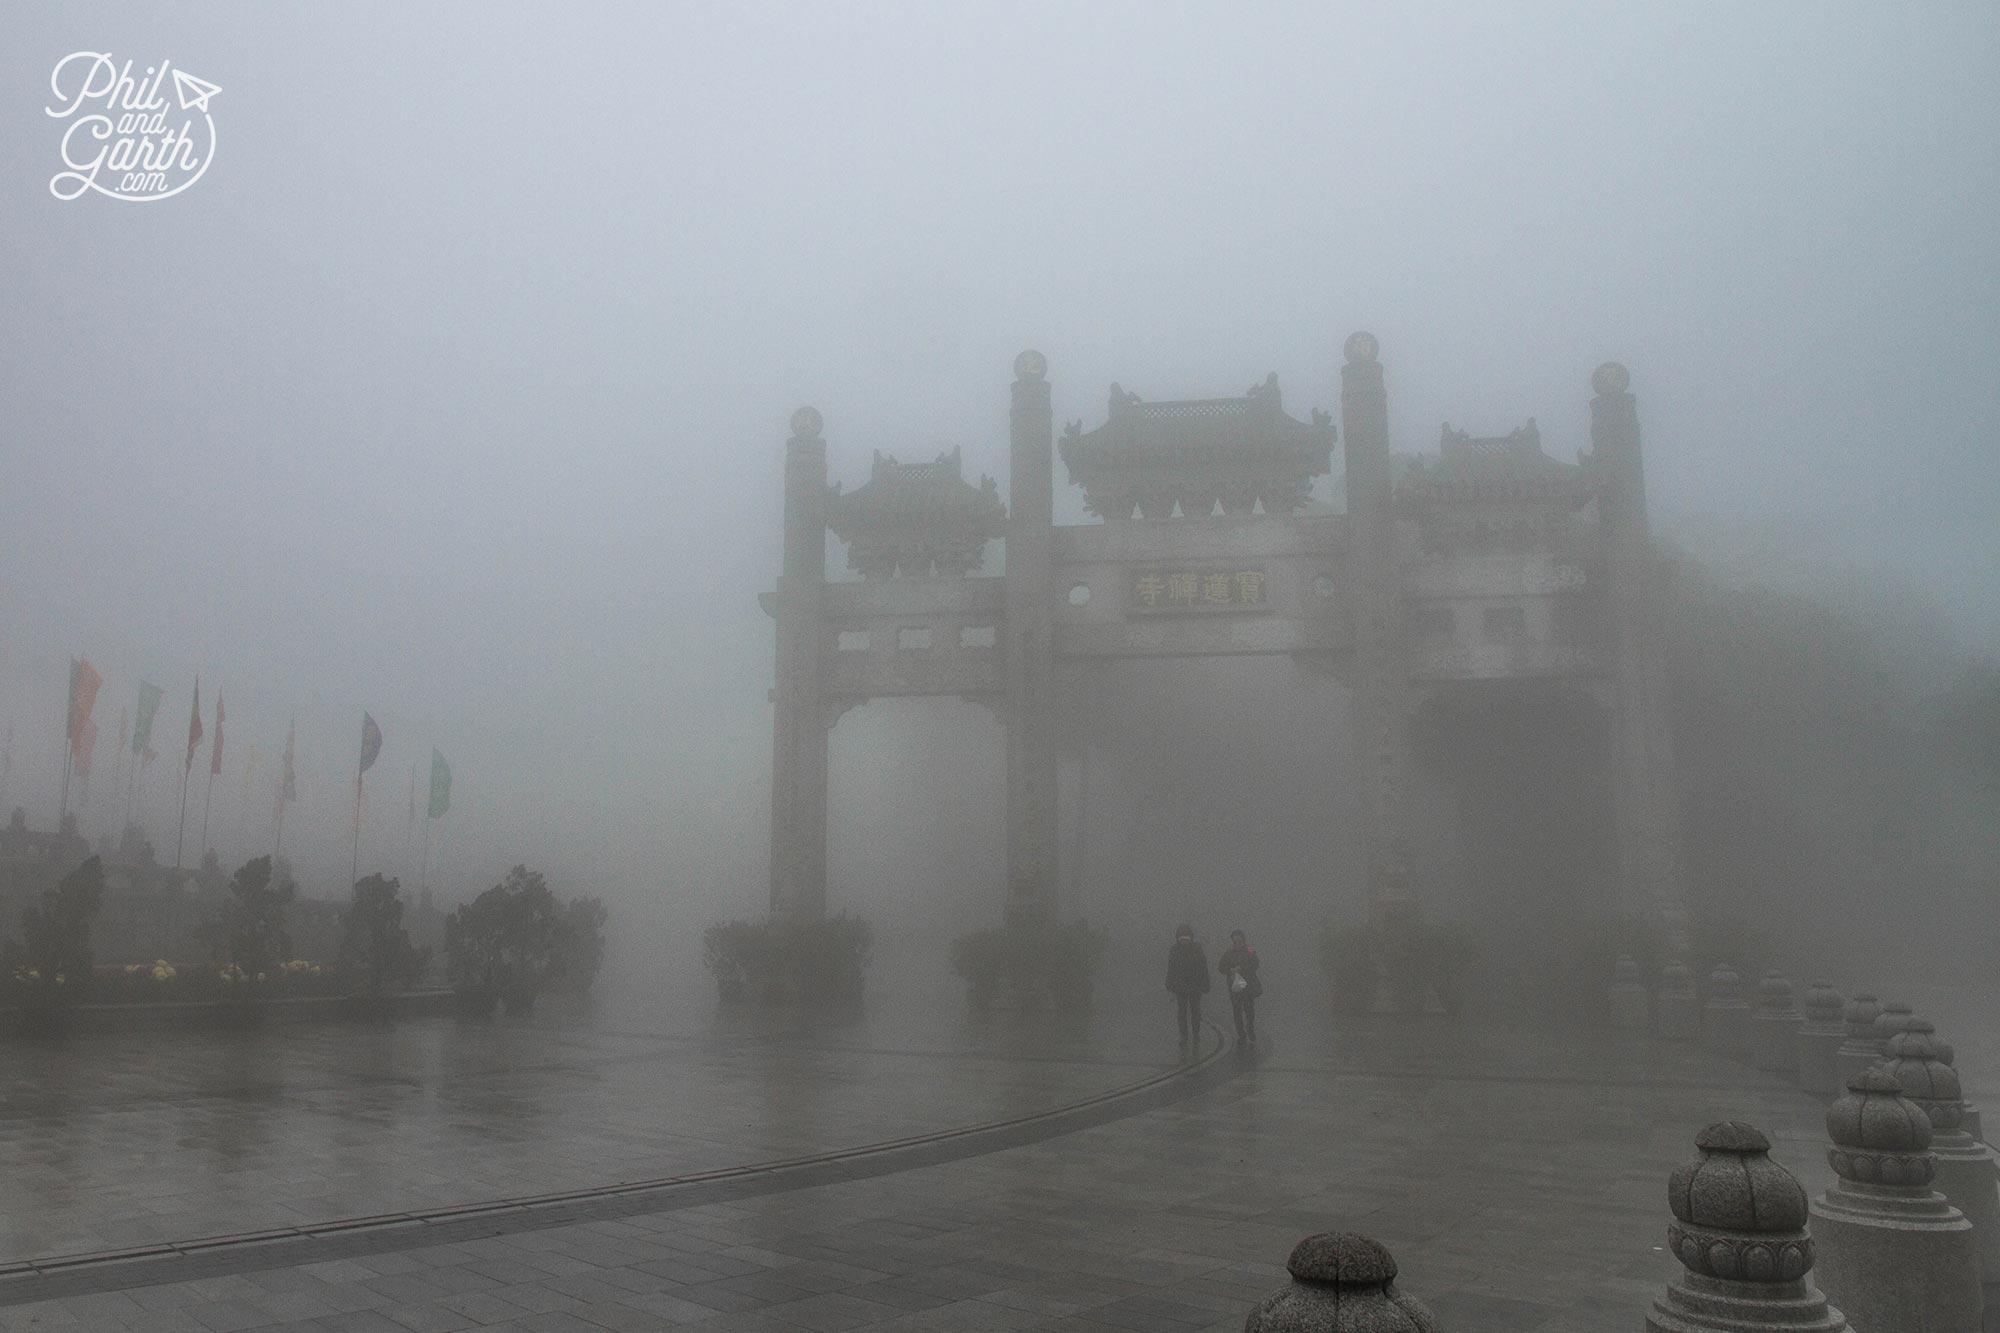 Lantau Island with practically no visibility!